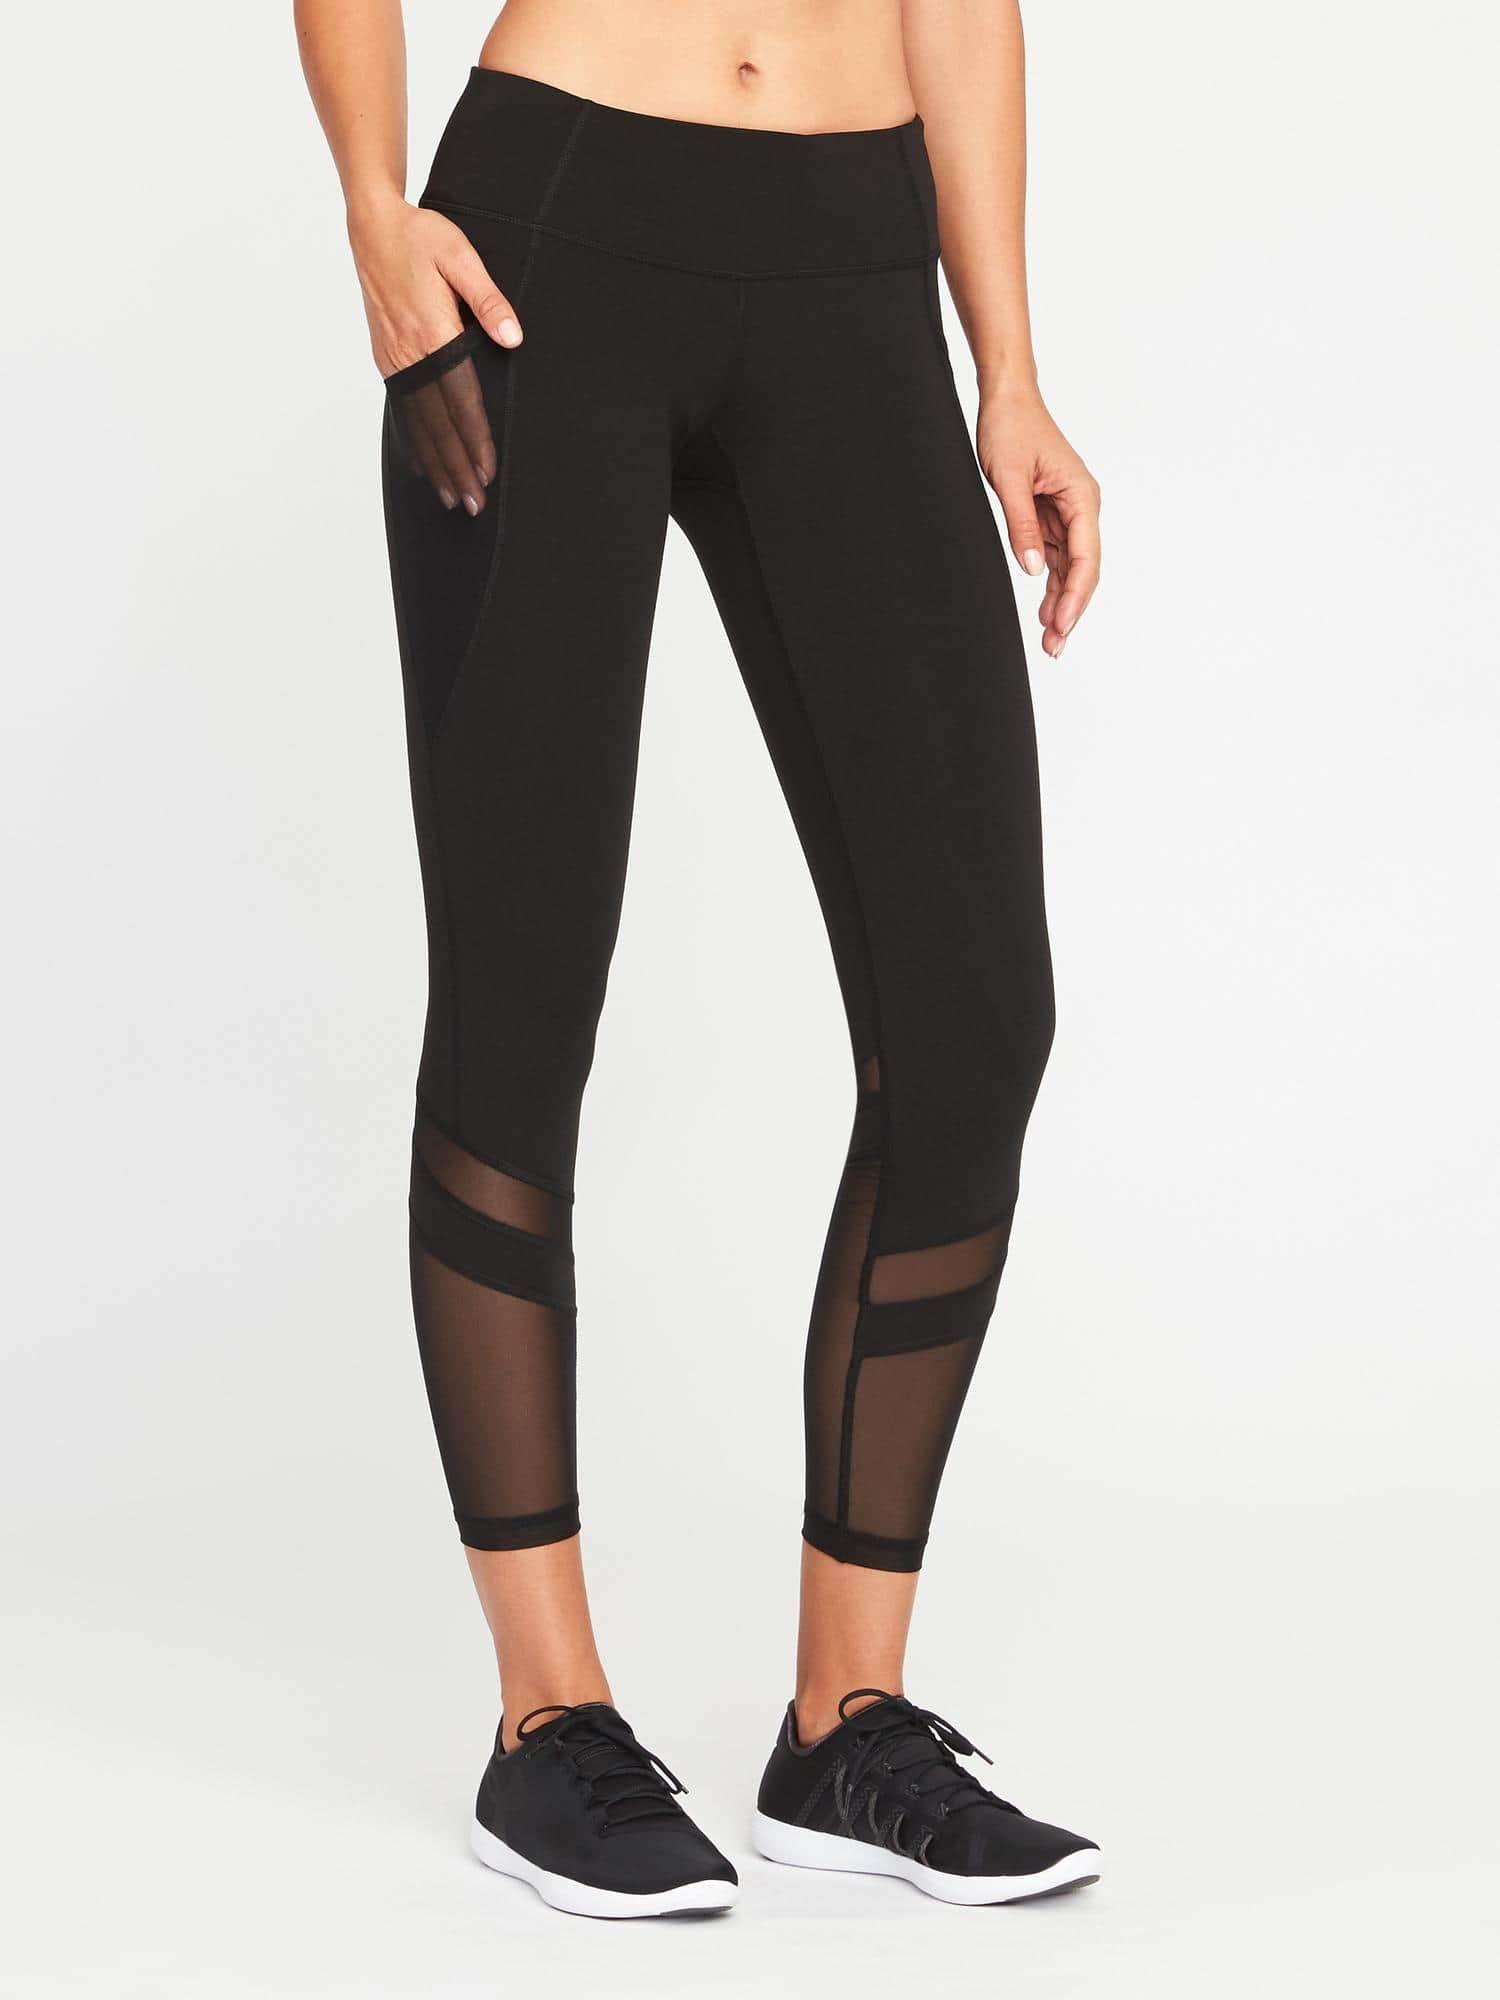 d9b2b7bcd656b4 product photo Women's Leggings, Mesh Workout Leggings, Fitness Fashion,  Fitness Clothing, Athleisure